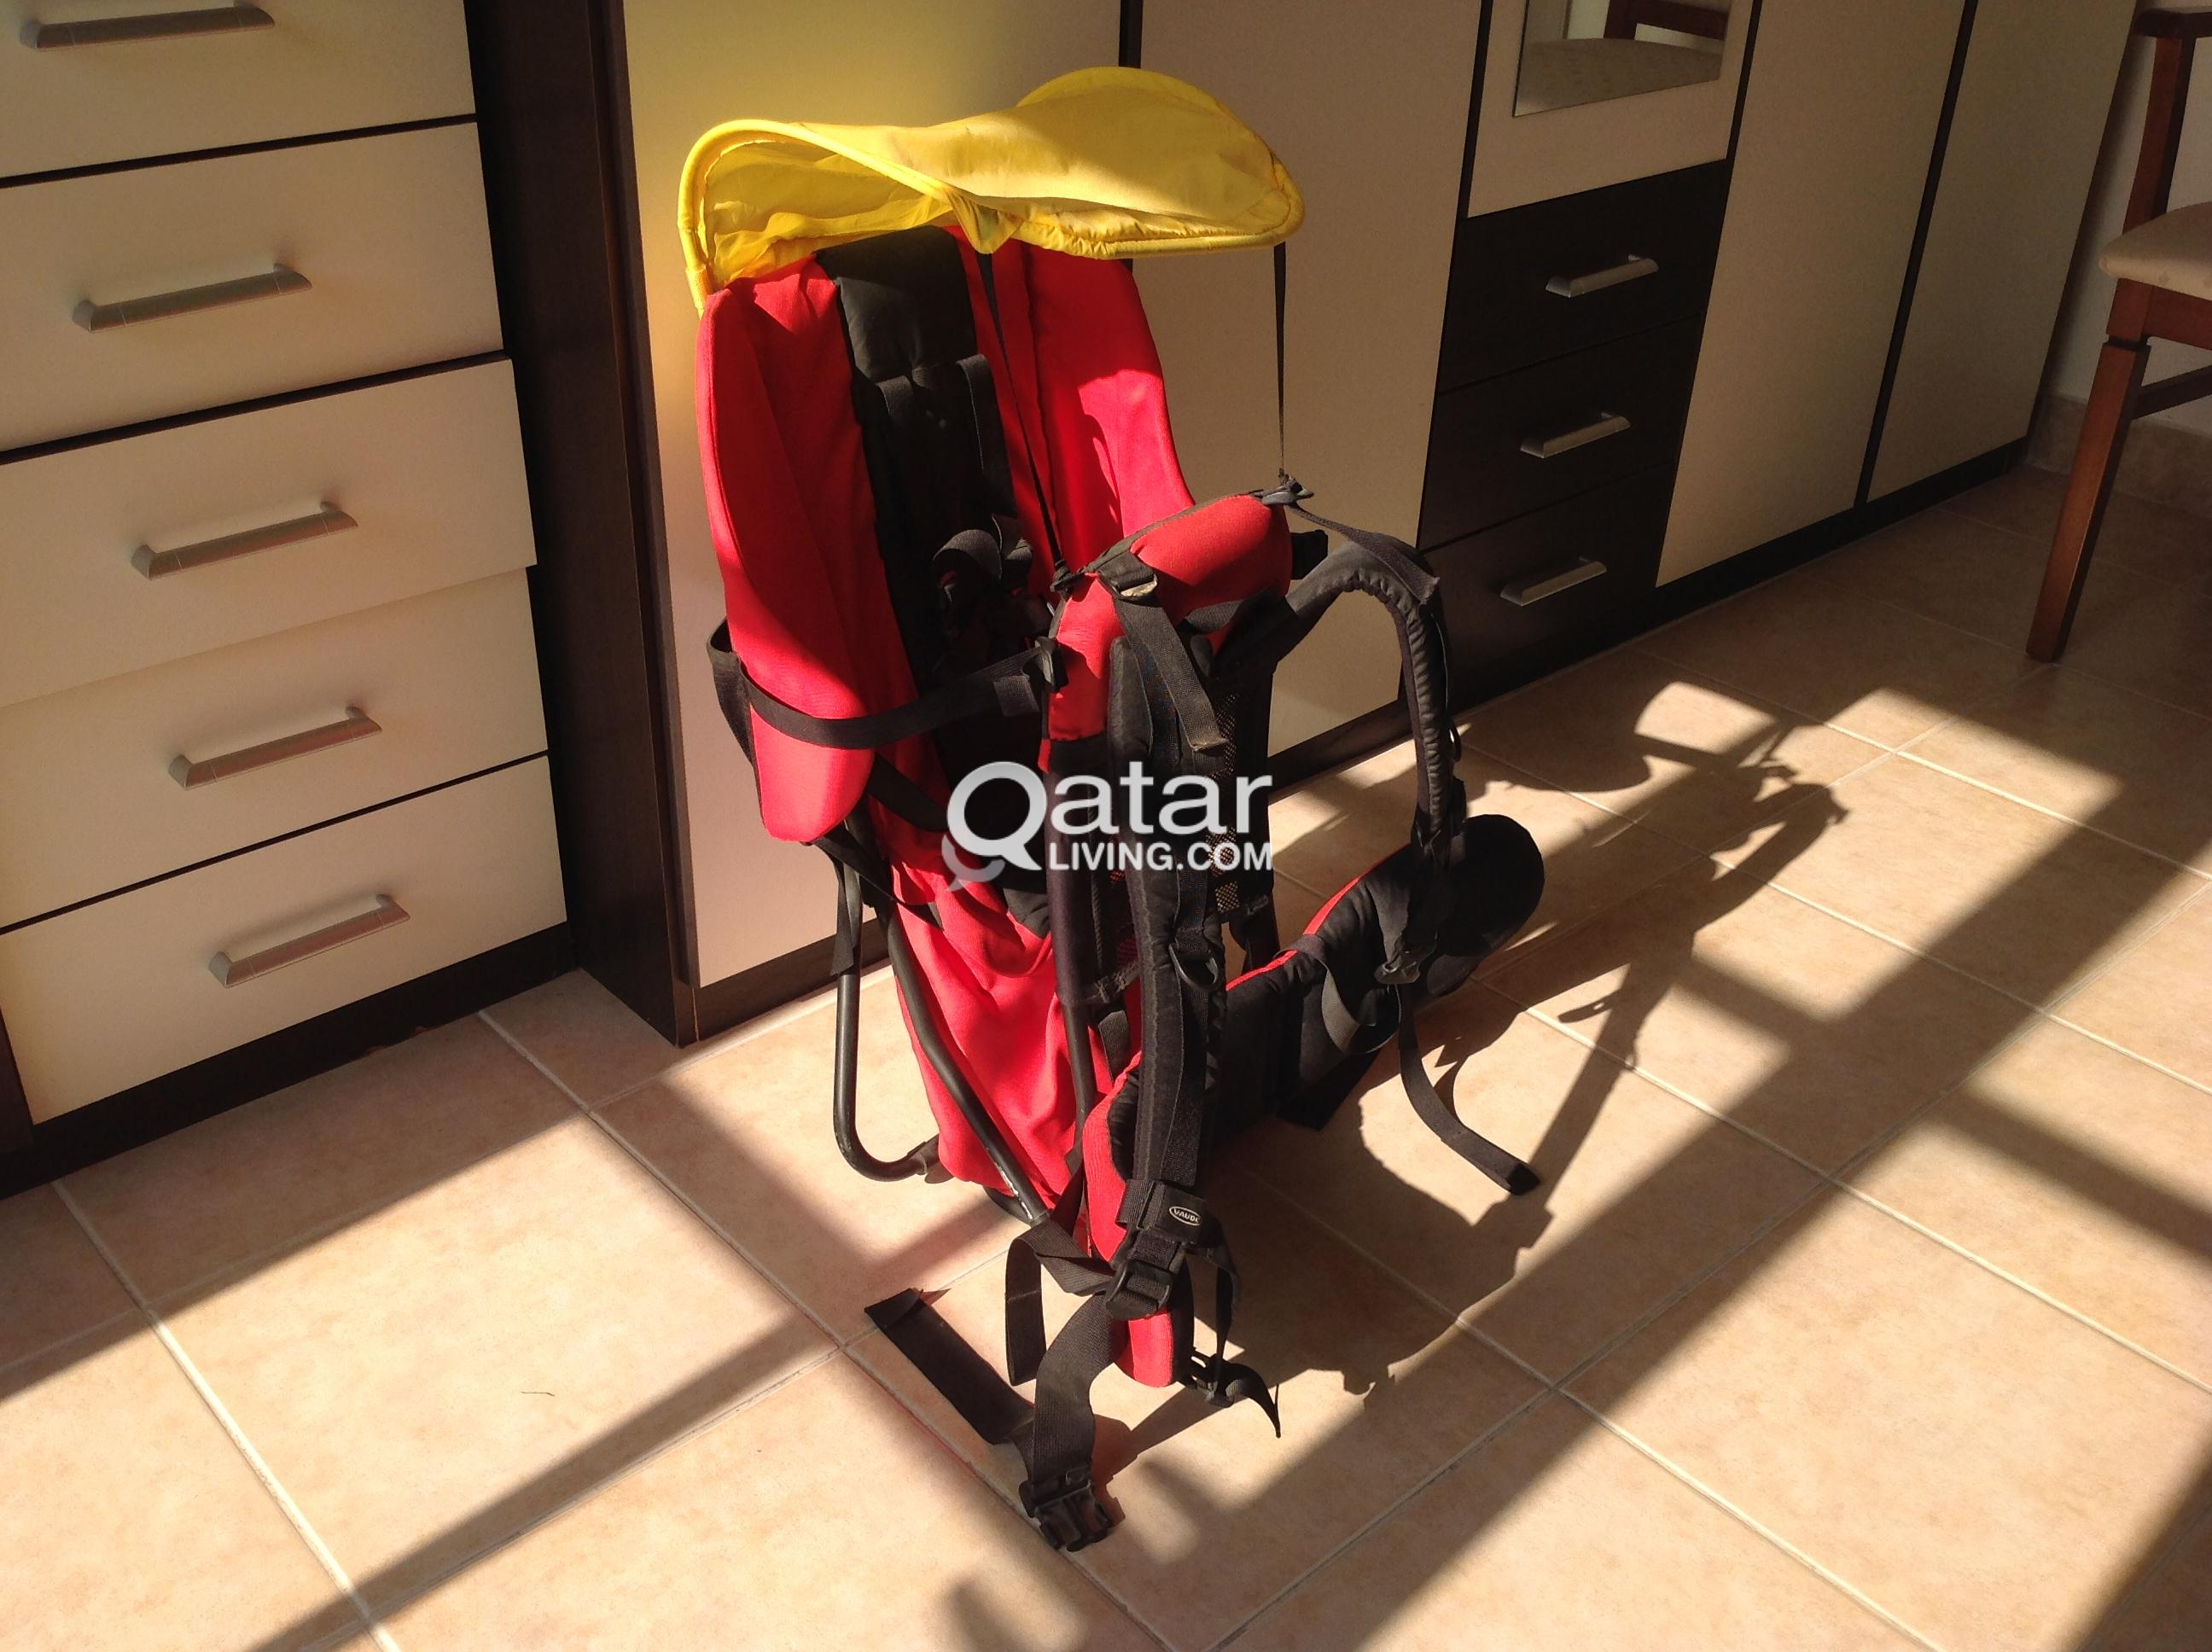 Numerous baby items 2 bikes sandpit slide Britax car seat baby